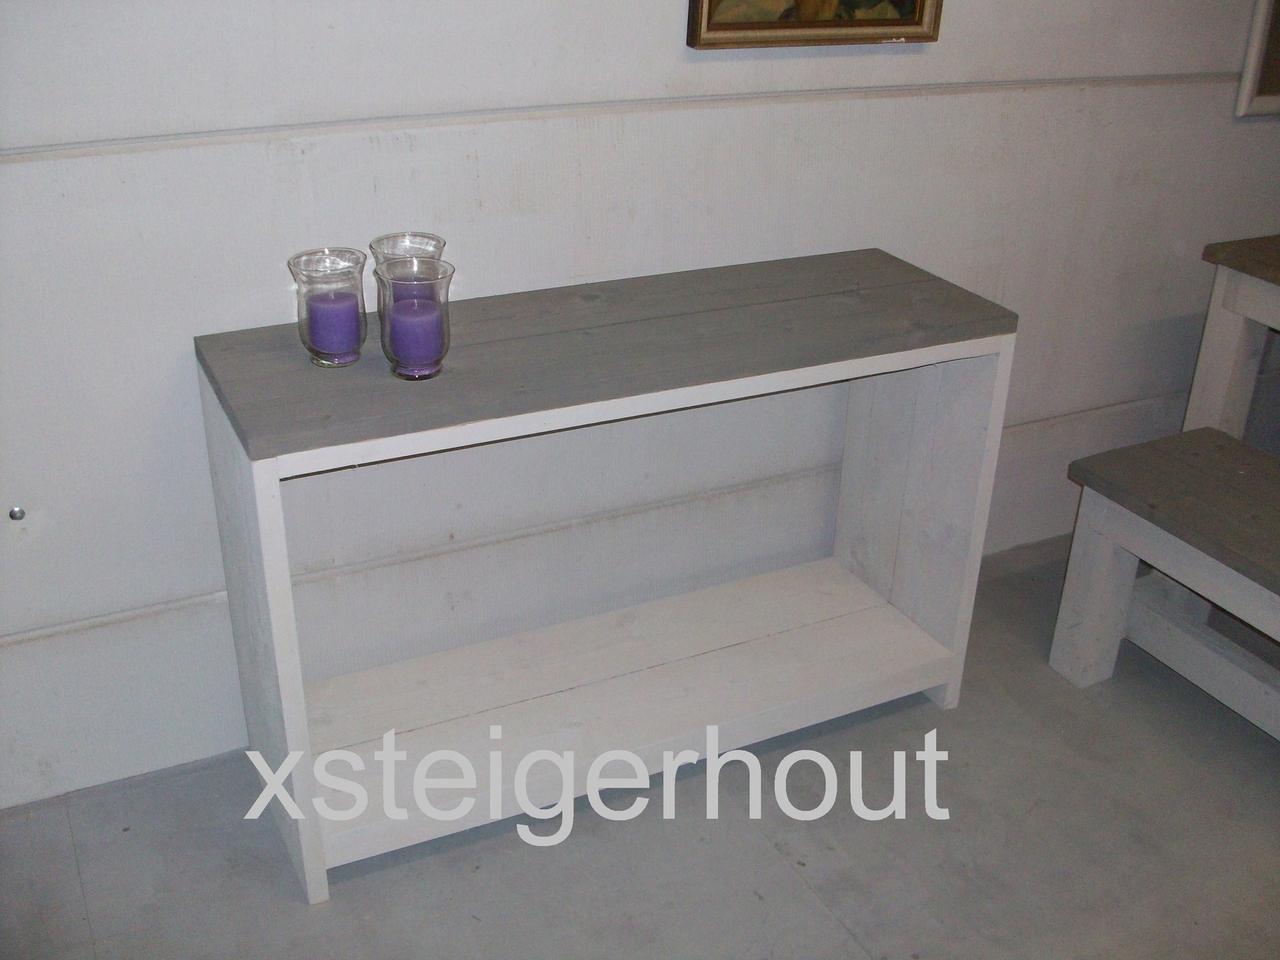 Smalle Sidetable 20 Cm Diep.Smalle Sidetable Op Maat Bouwpakket Steigerhout